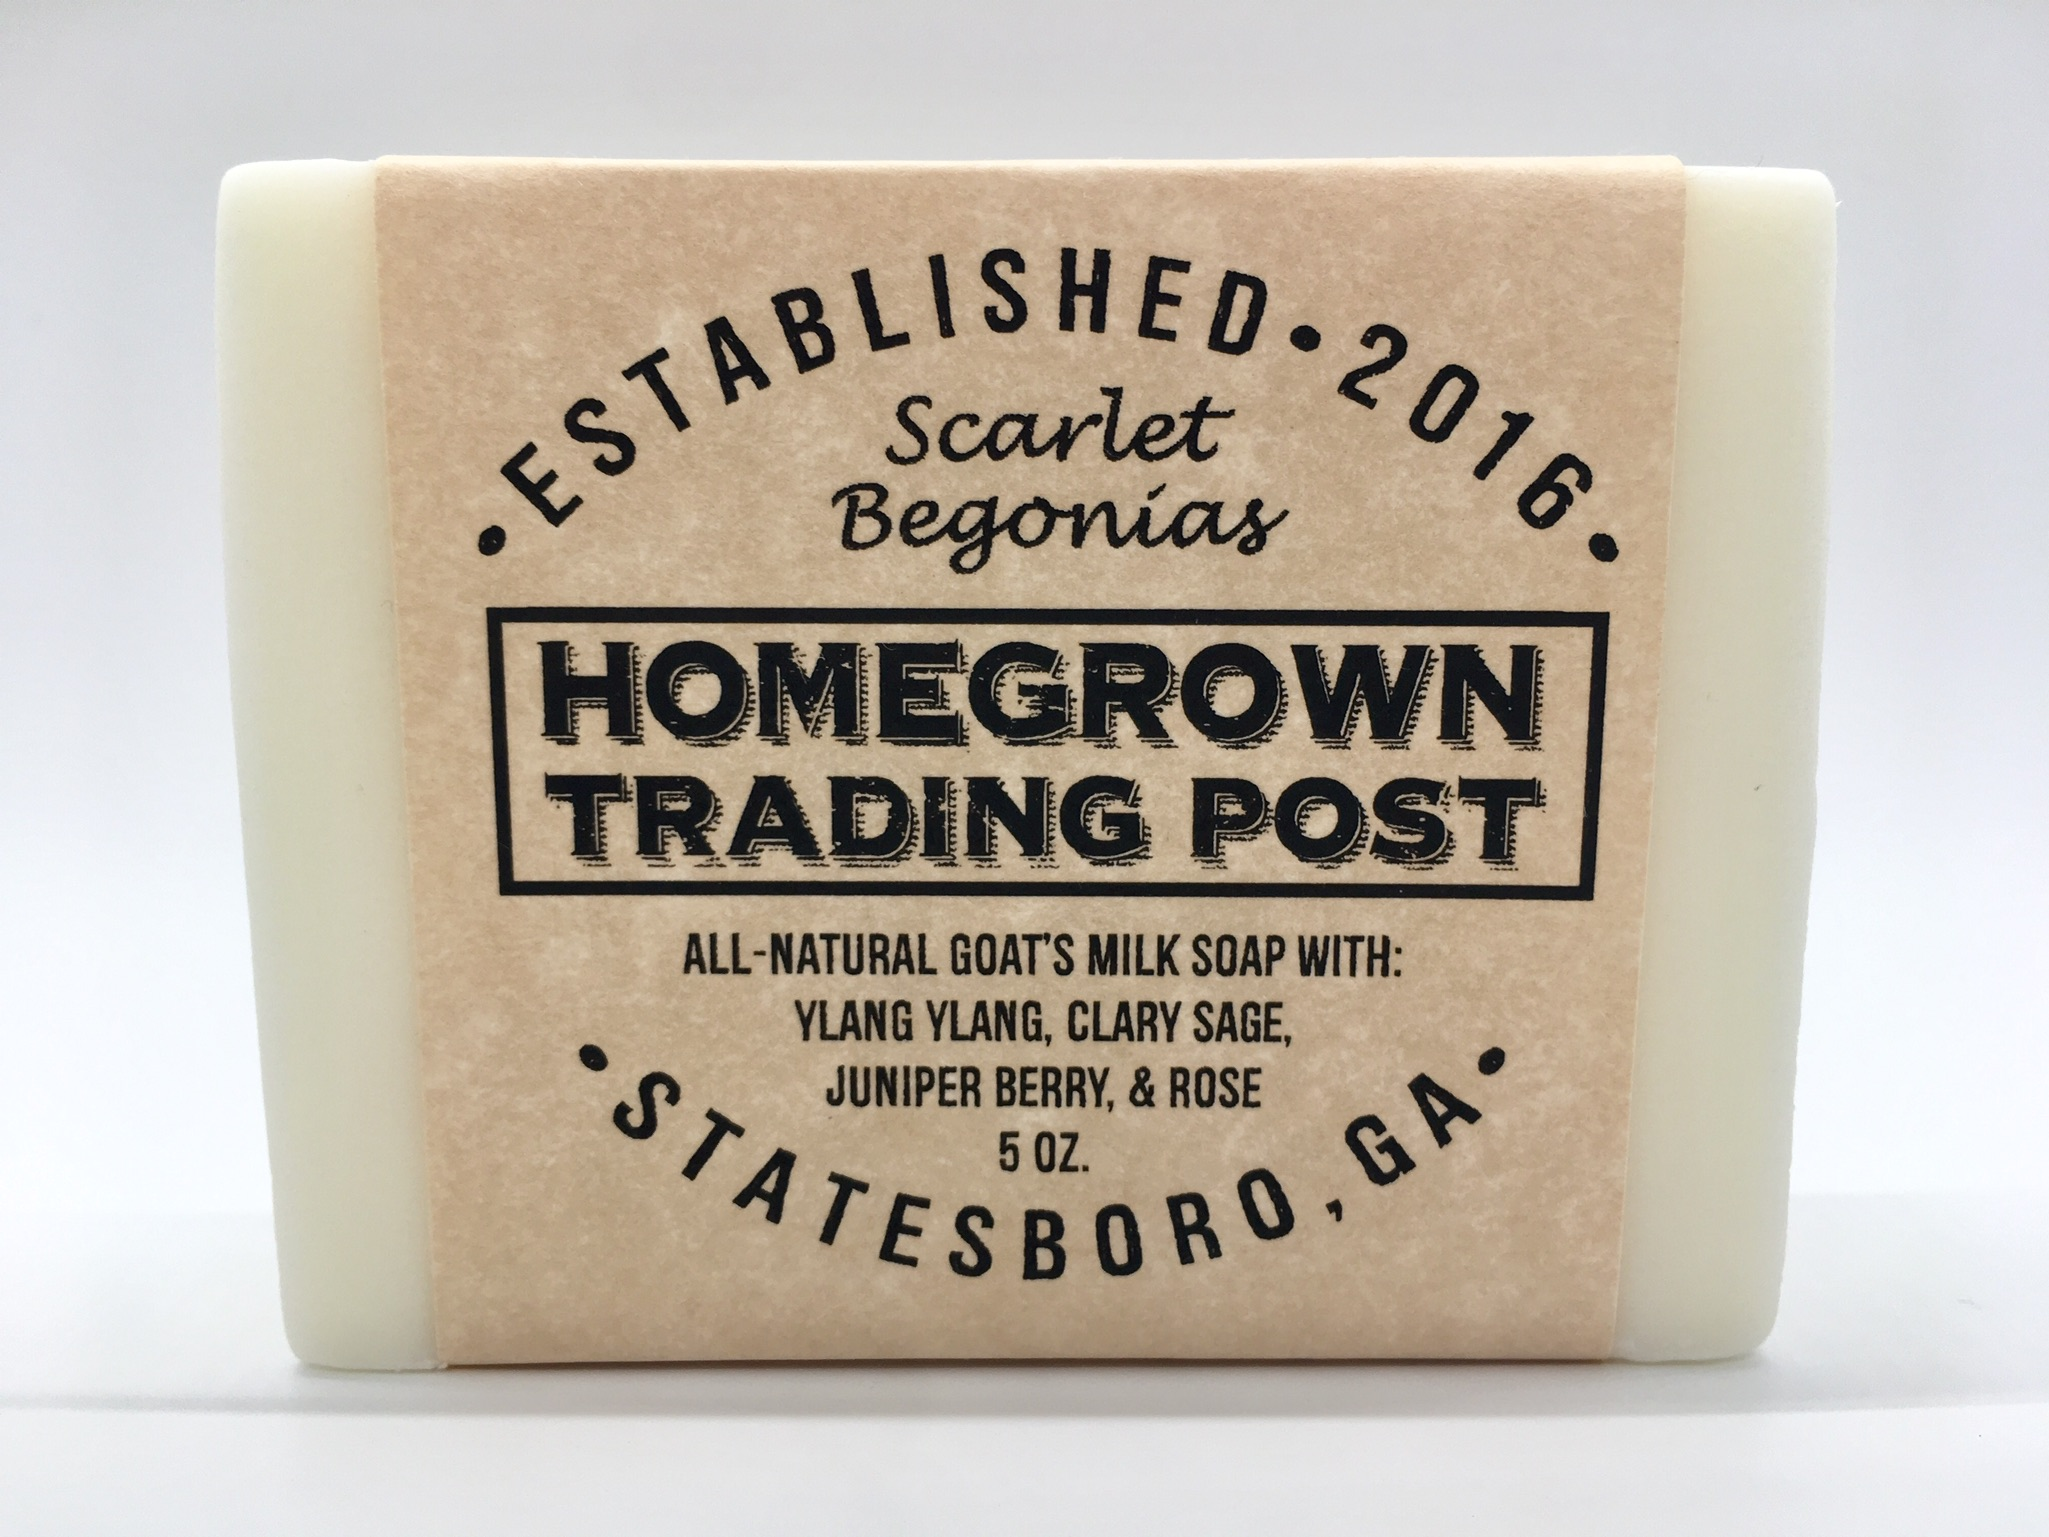 Scarlet Begonias - Goat's Milk Soap